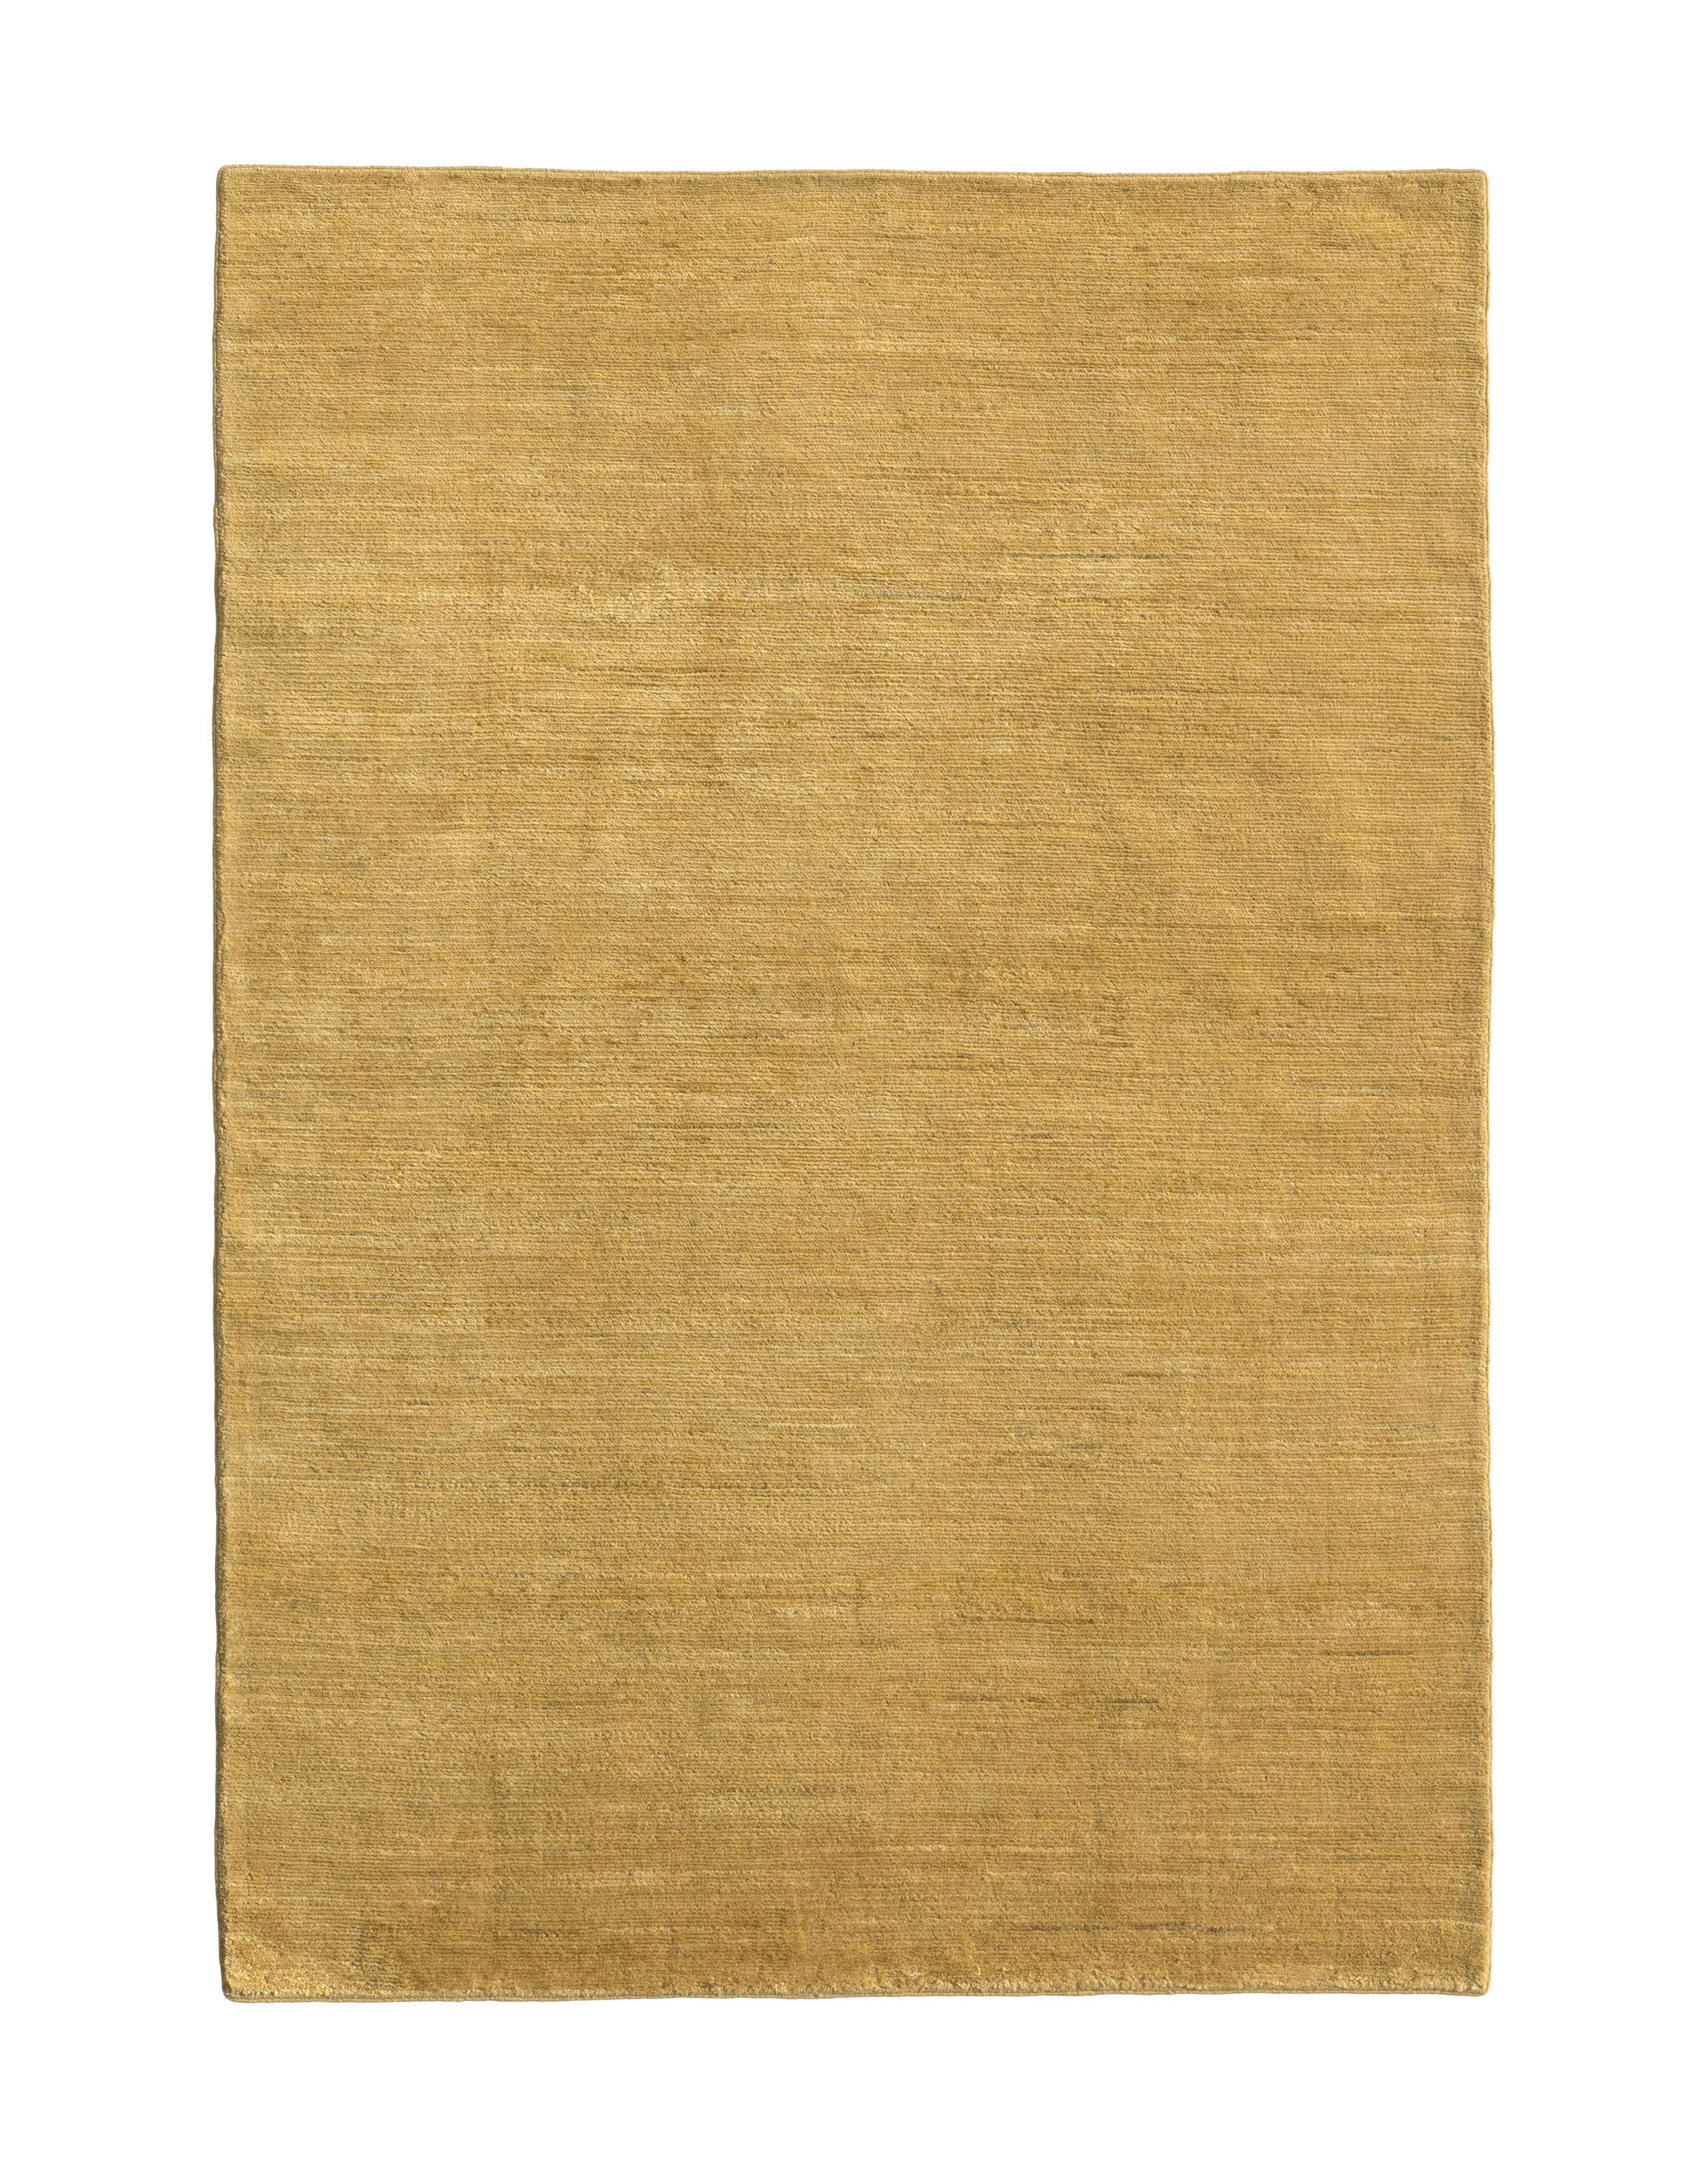 Déco - Tapis - Tapis Persian Colors / 170 x 240 cm - Nanimarquina - Jaune Pollen - Laine